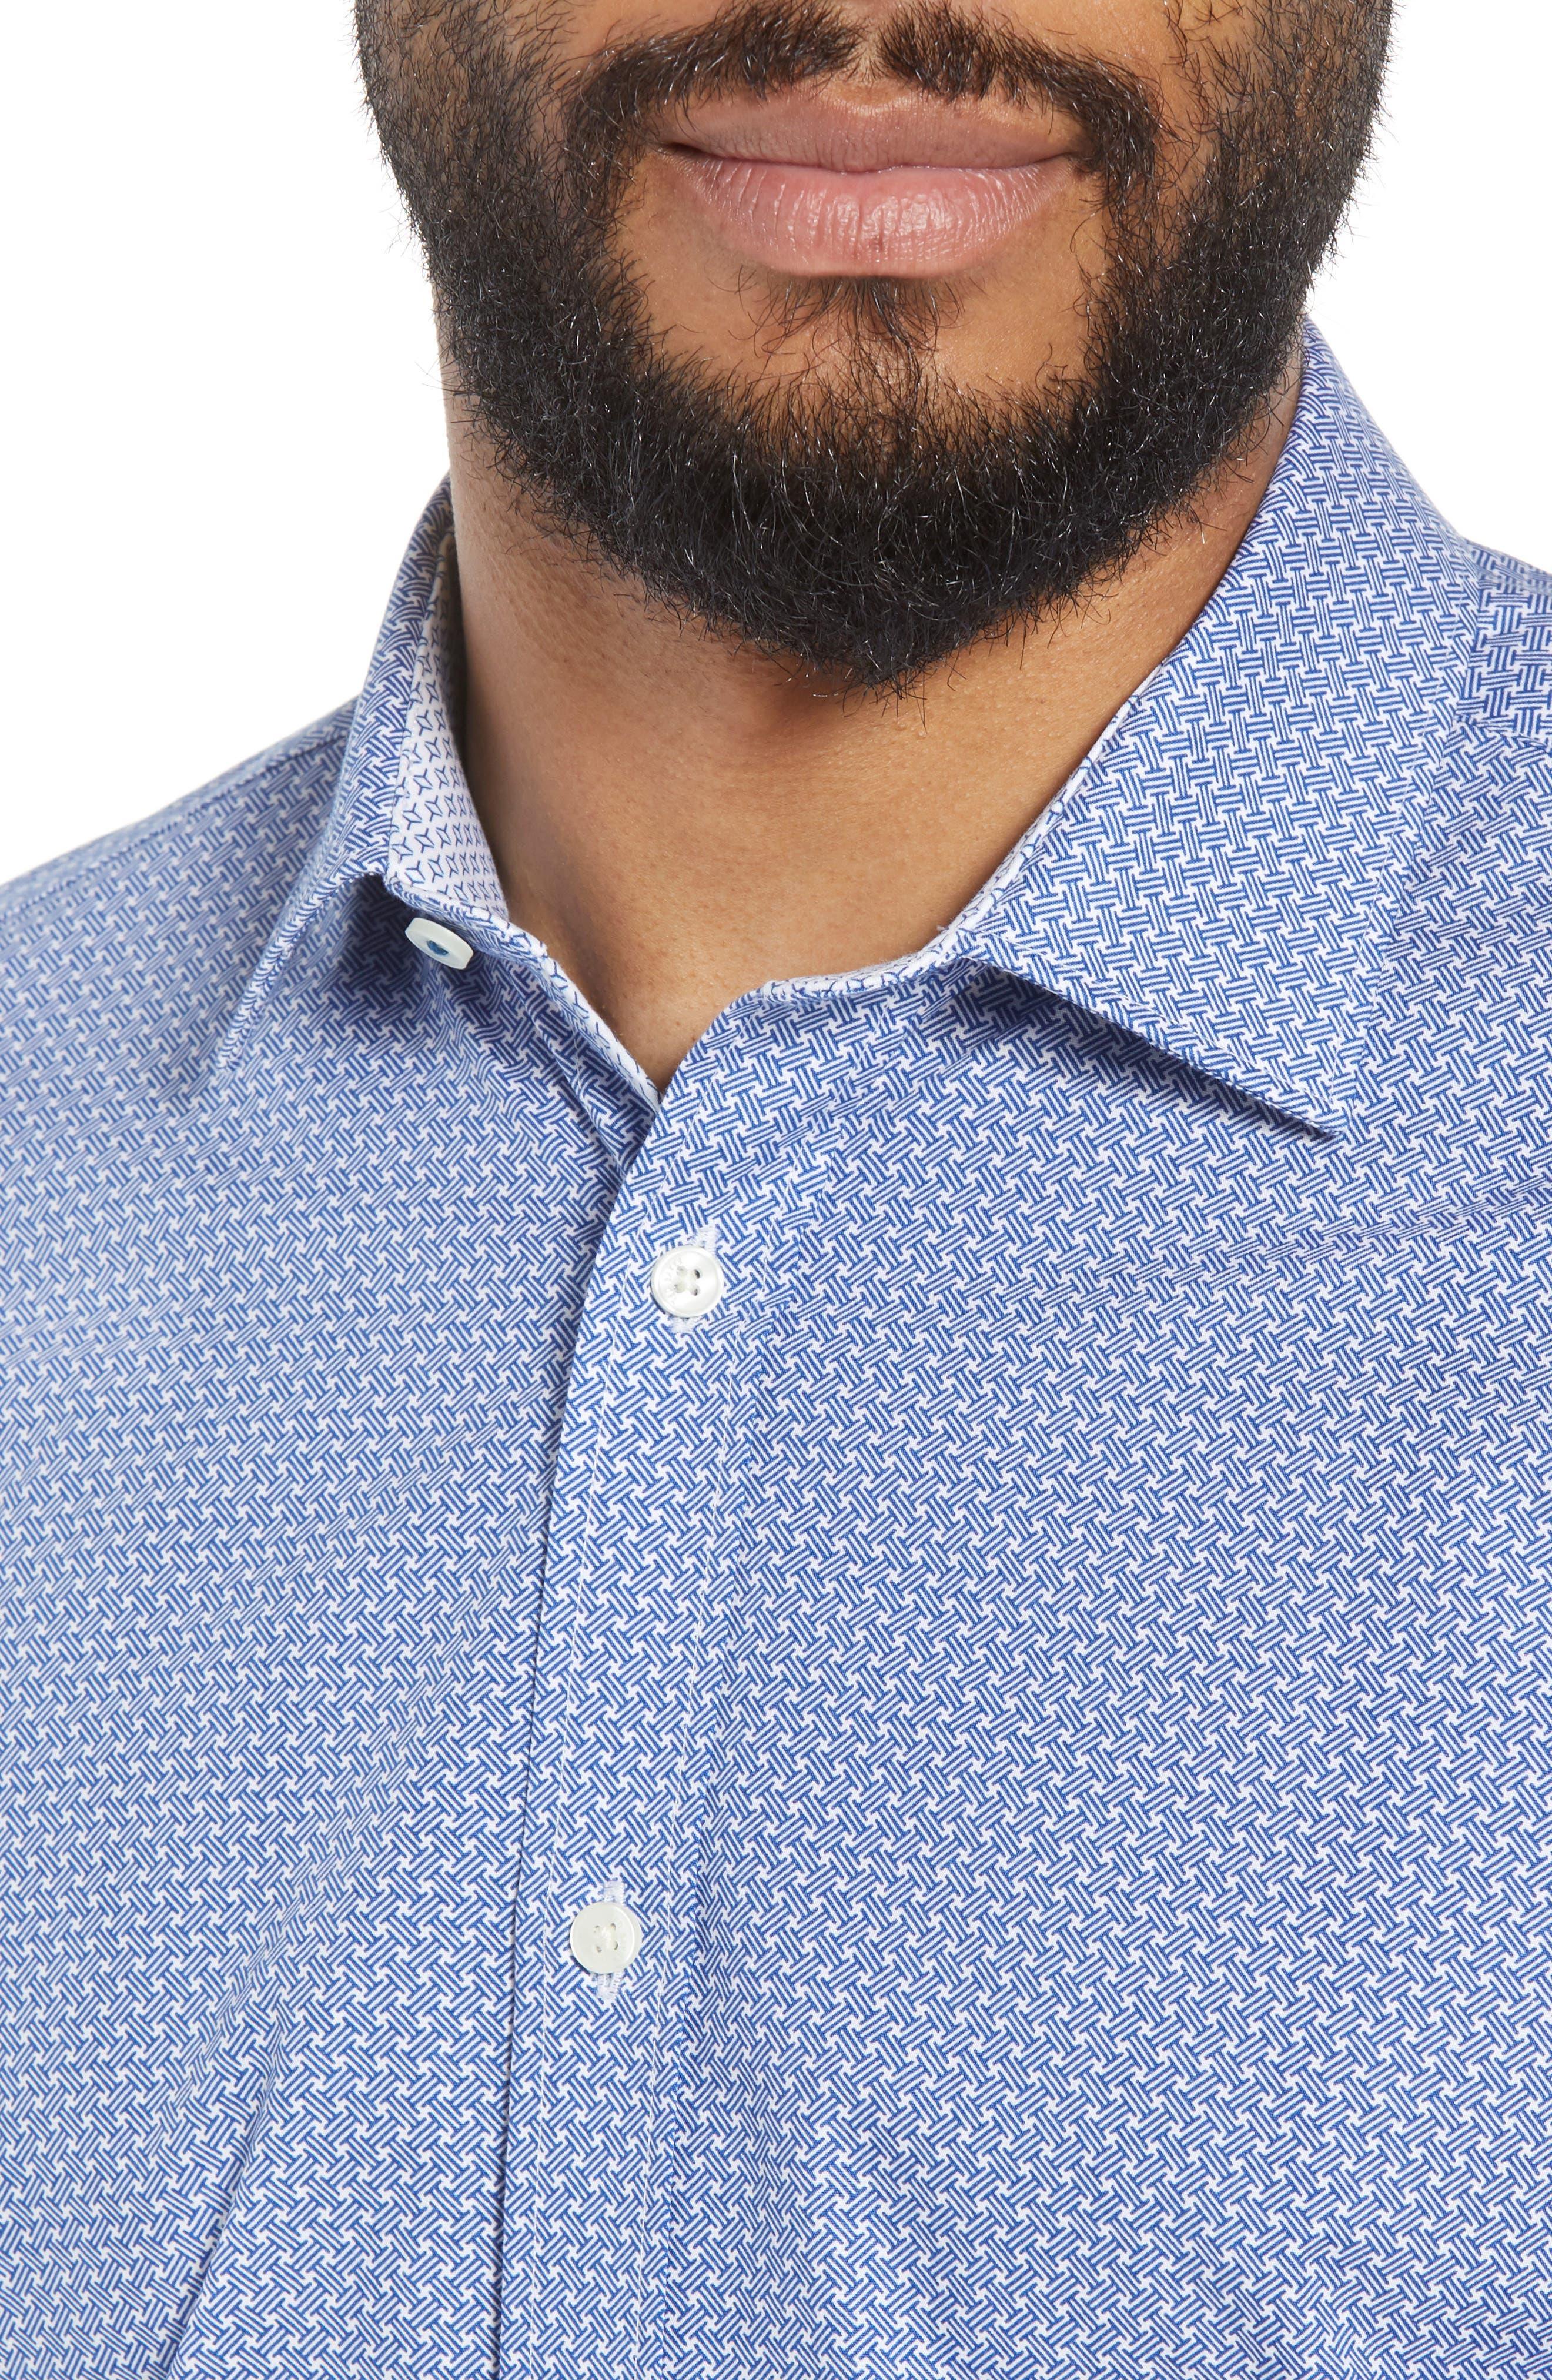 Rugber Slim Fit Print Dress Shirt,                             Alternate thumbnail 2, color,                             BLUE